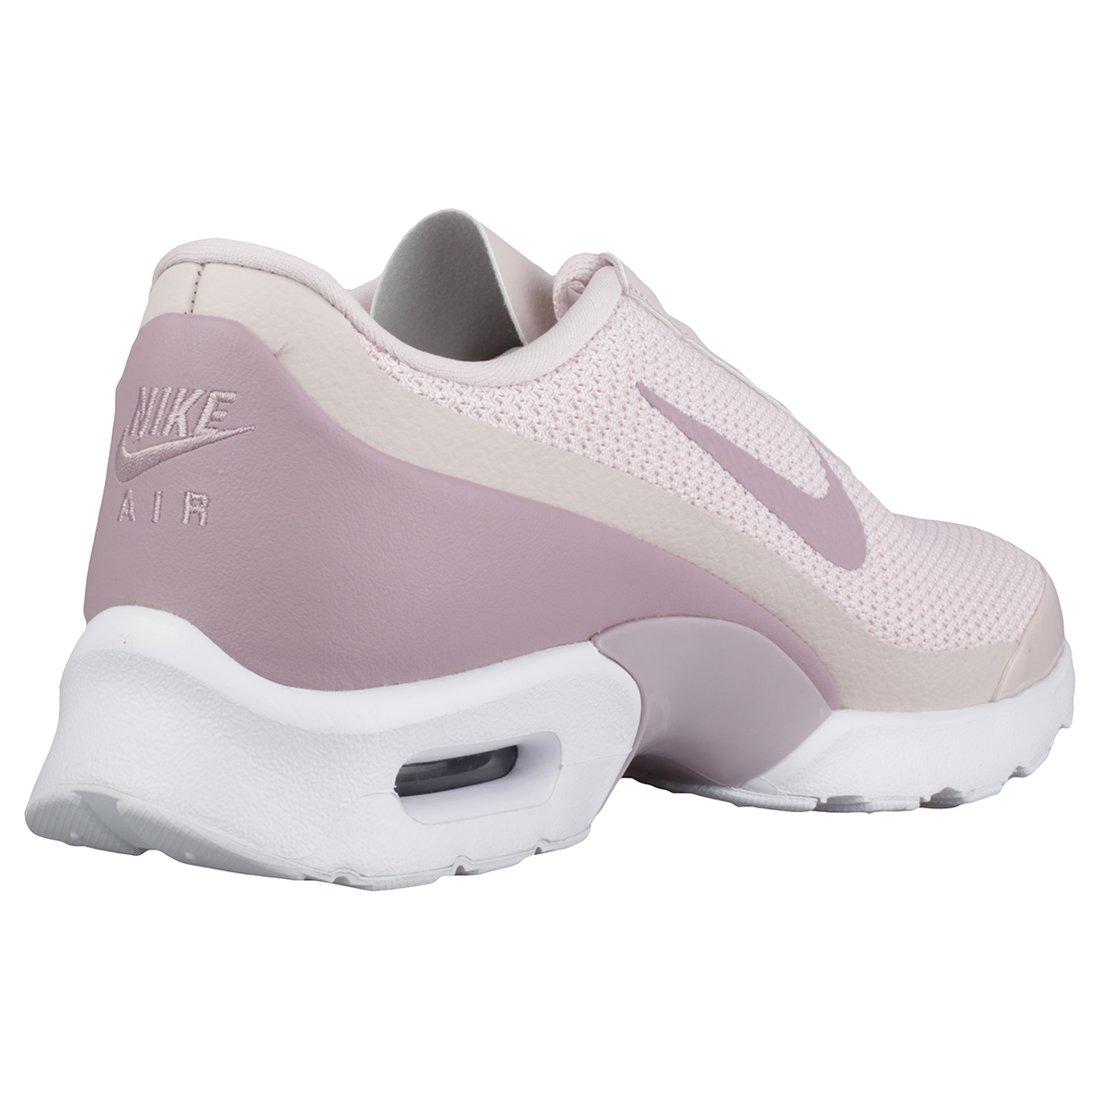 Nike 896194-604 Damen Durchgängies Plateau Sandalen mit Keilabsatz Keilabsatz Keilabsatz dd2fea